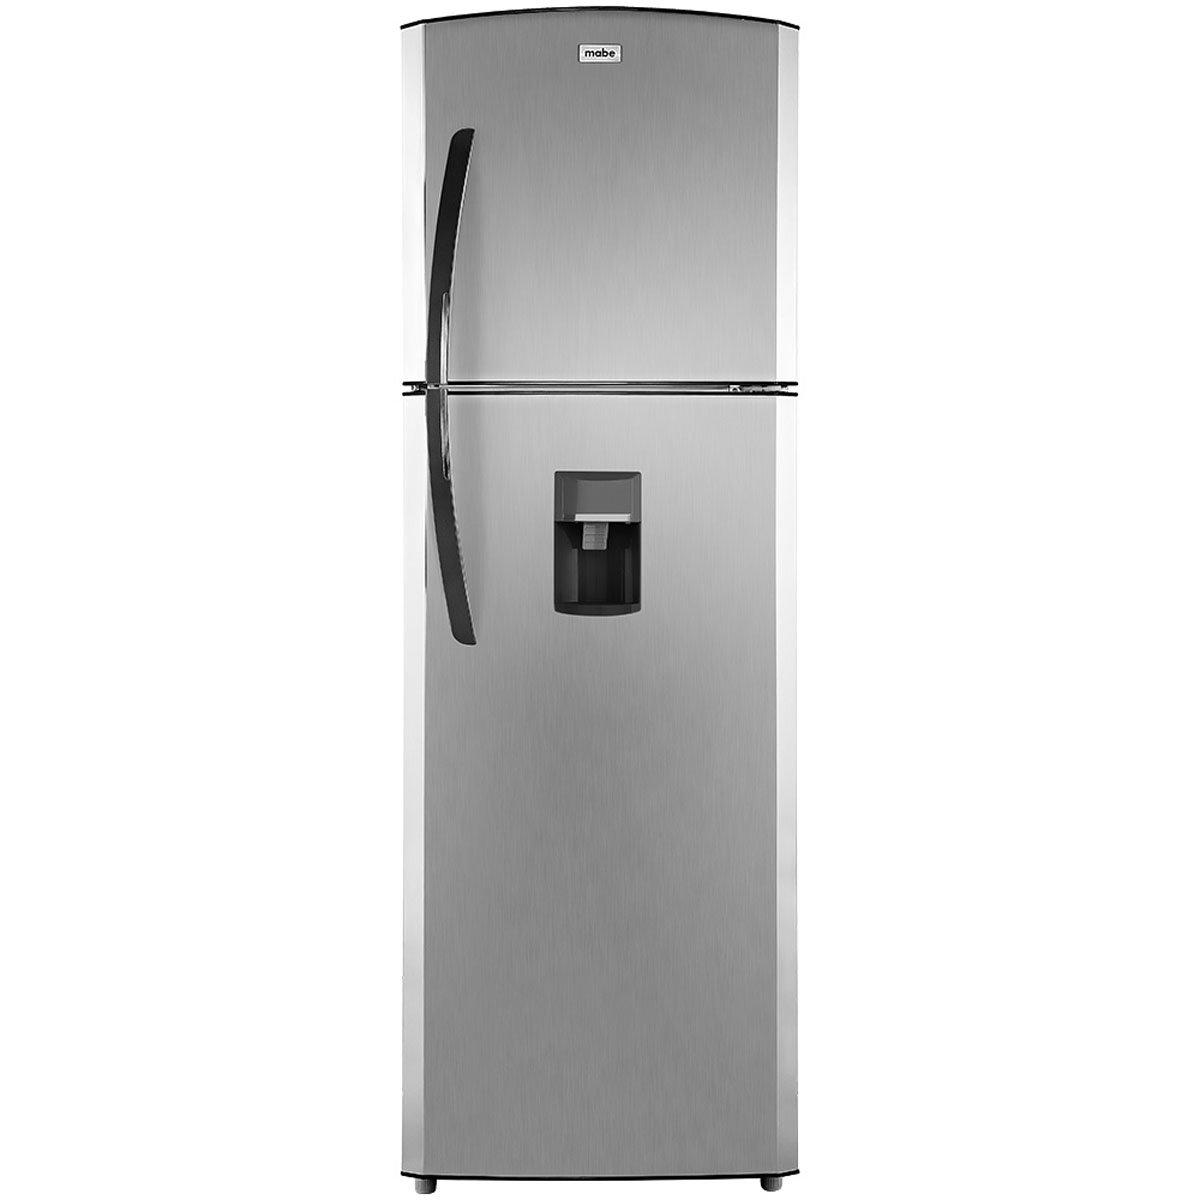 Refrigerador Mabe Top Mount 11 Pies Grafito